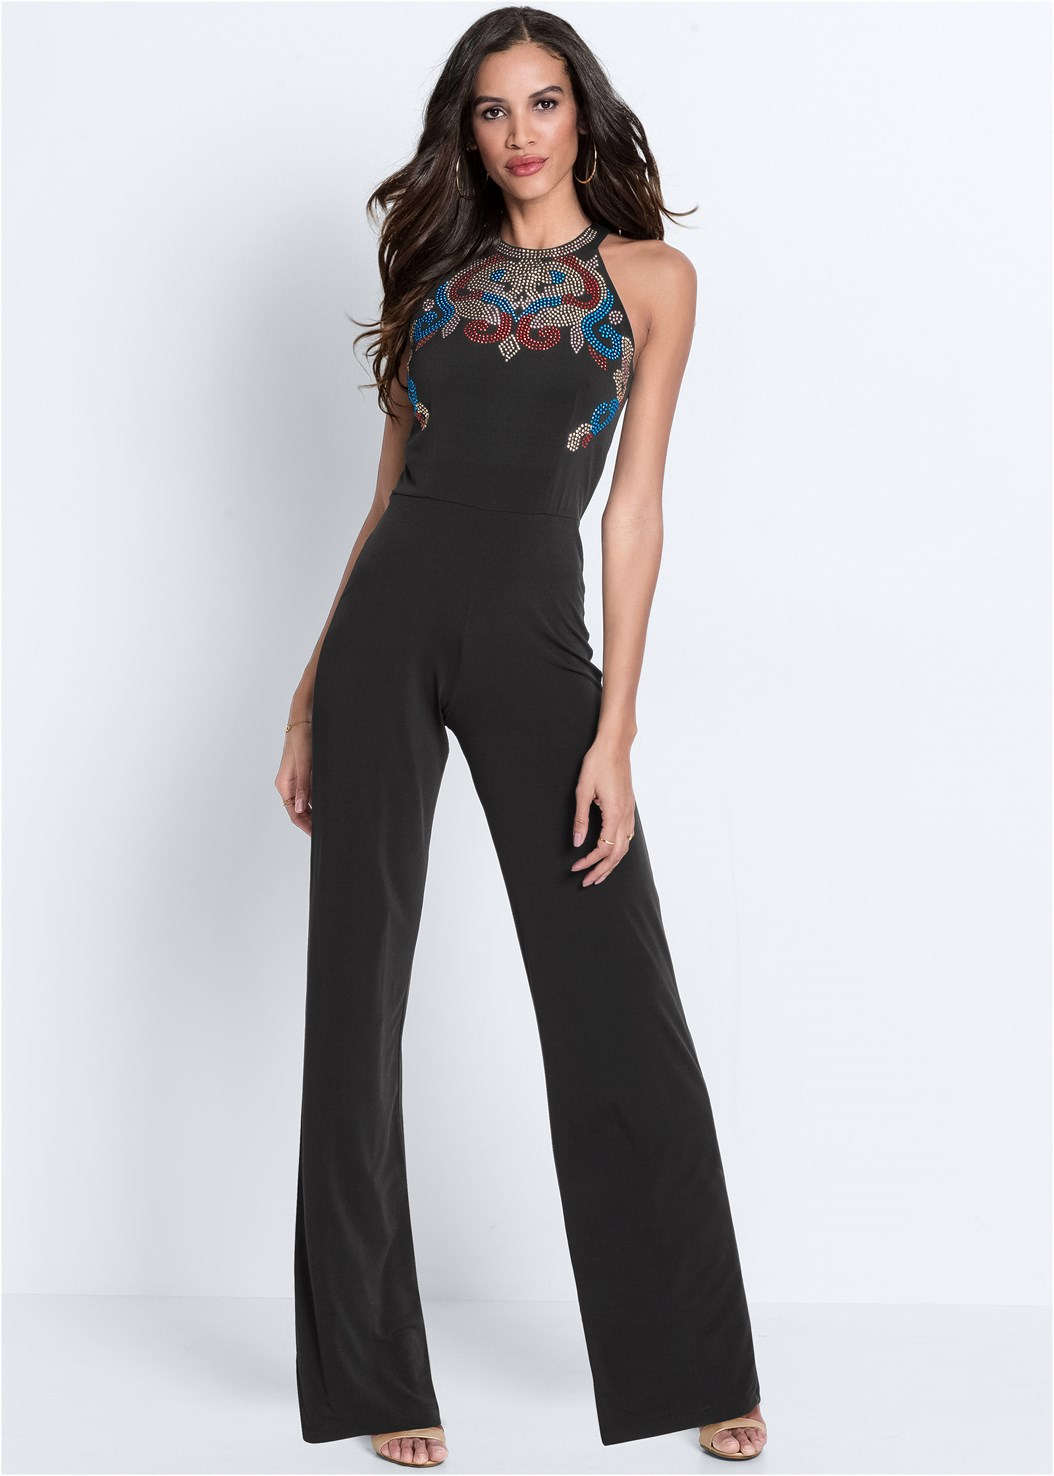 Embellished Jumpsuit,Smooth Longline Push Up Bra,High Heel Strappy Sandals,Ring Detail Oversized Bag